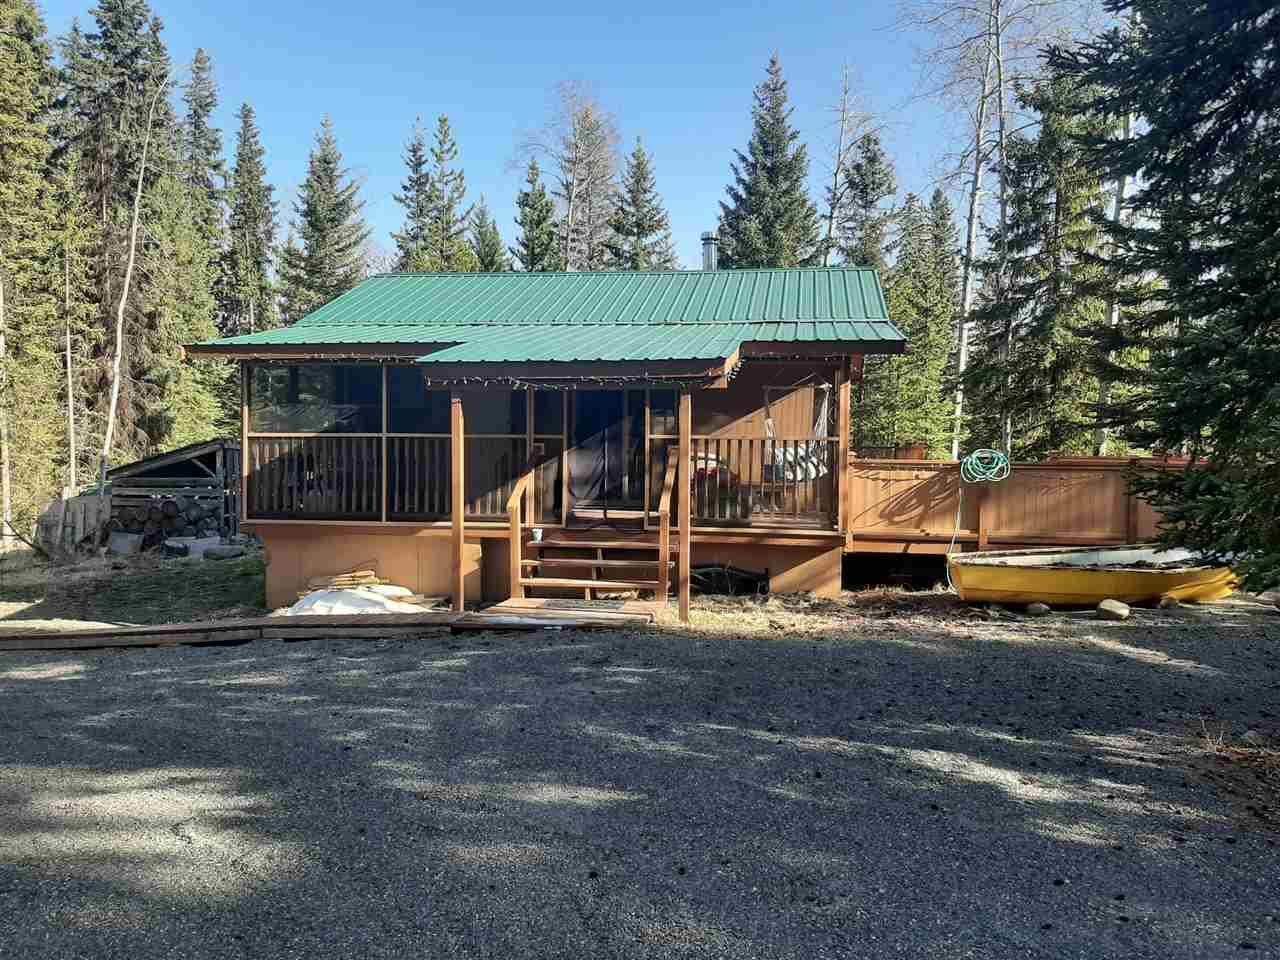 Main Photo: 7085 SALTER Road in Bridge Lake: Bridge Lake/Sheridan Lake House for sale (100 Mile House (Zone 10))  : MLS®# R2449822